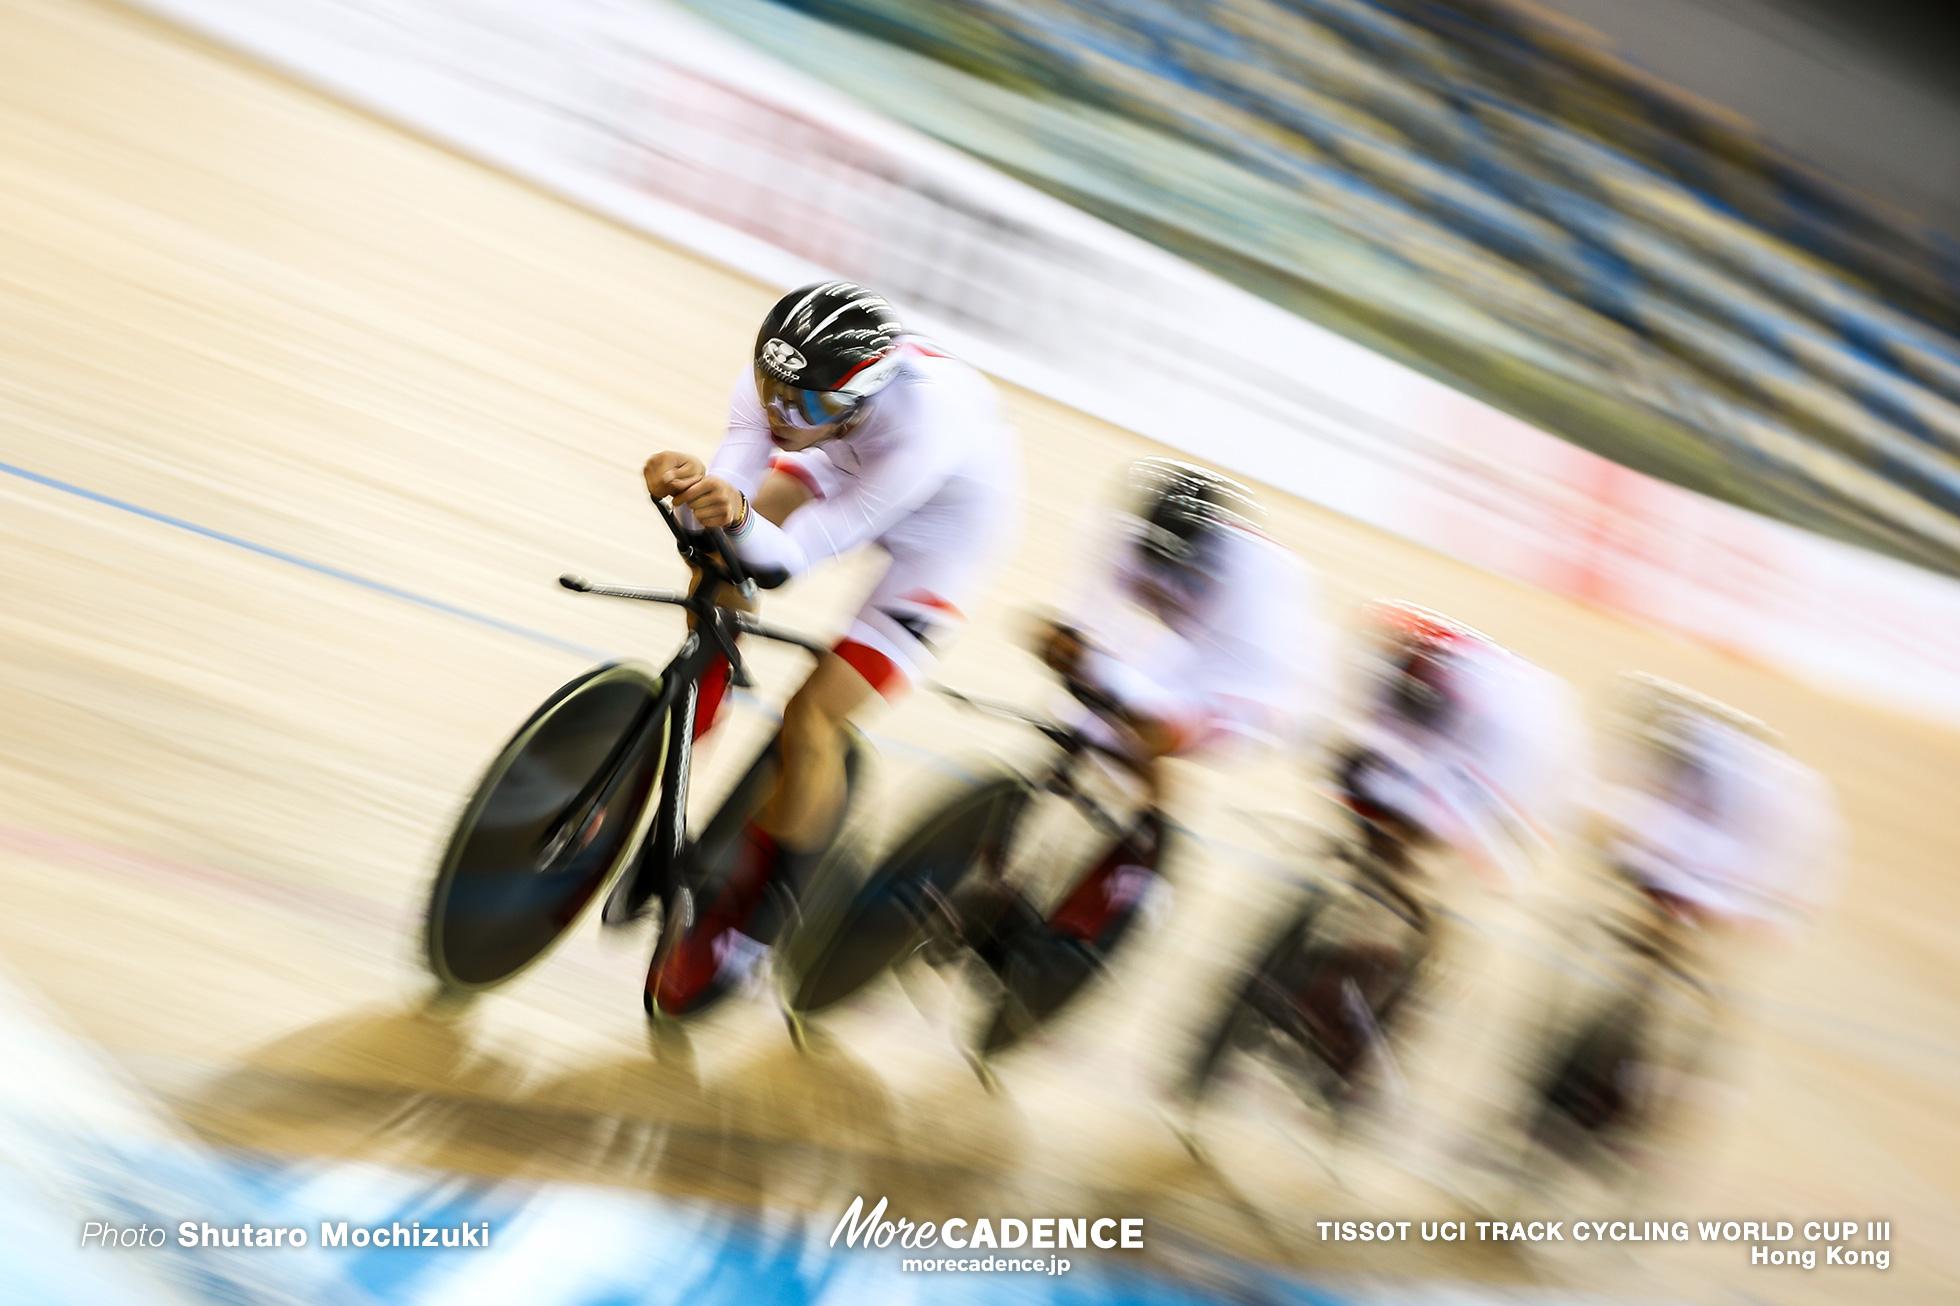 Men's Team Pursuit / TISSOT UCI TRACK CYCLING WORLD CUP III, Hong Kong